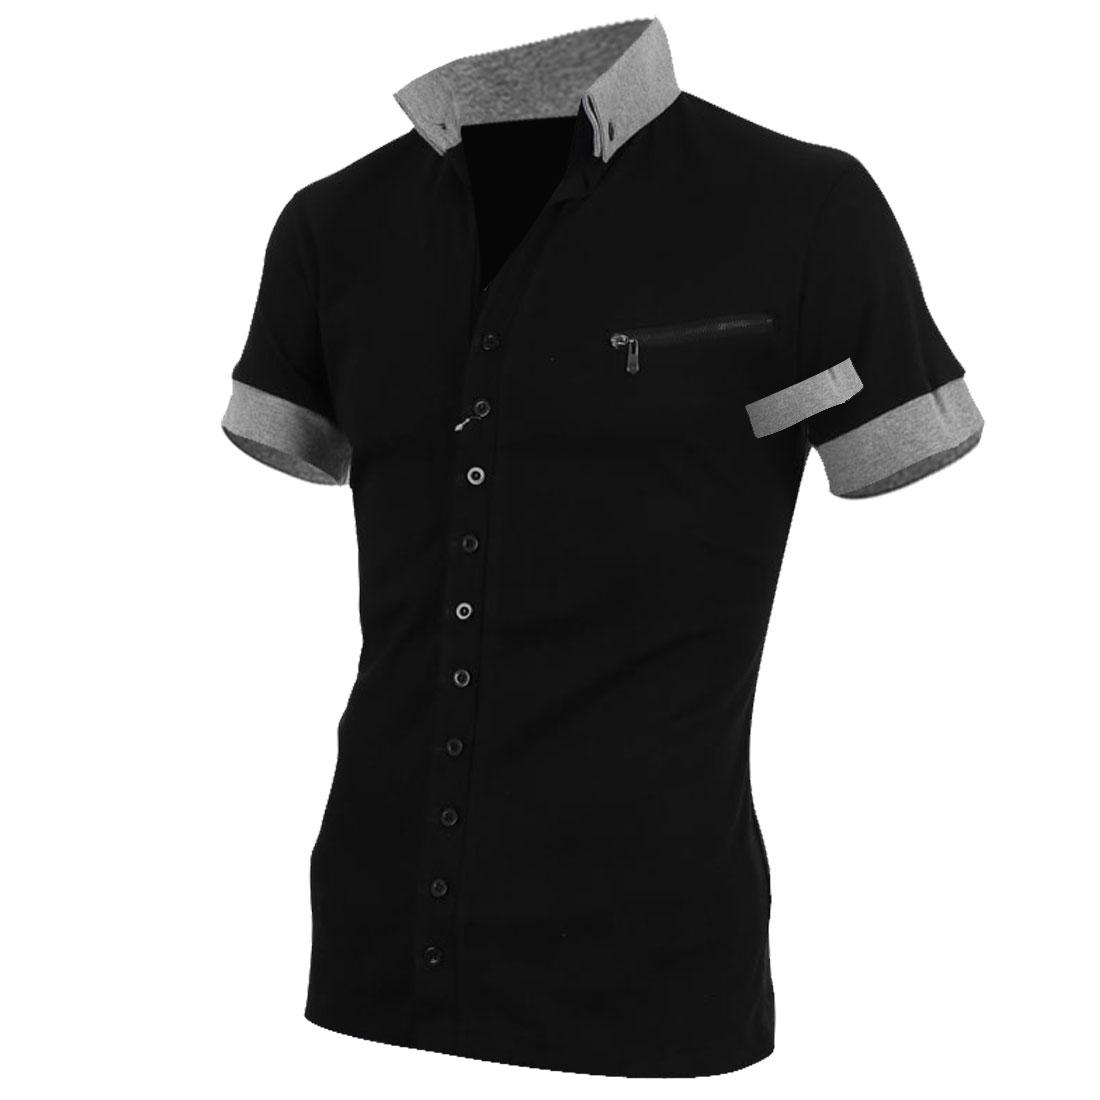 Men Button Front Style Short Sleeve Chest Zip Design Casual Shirt L Black